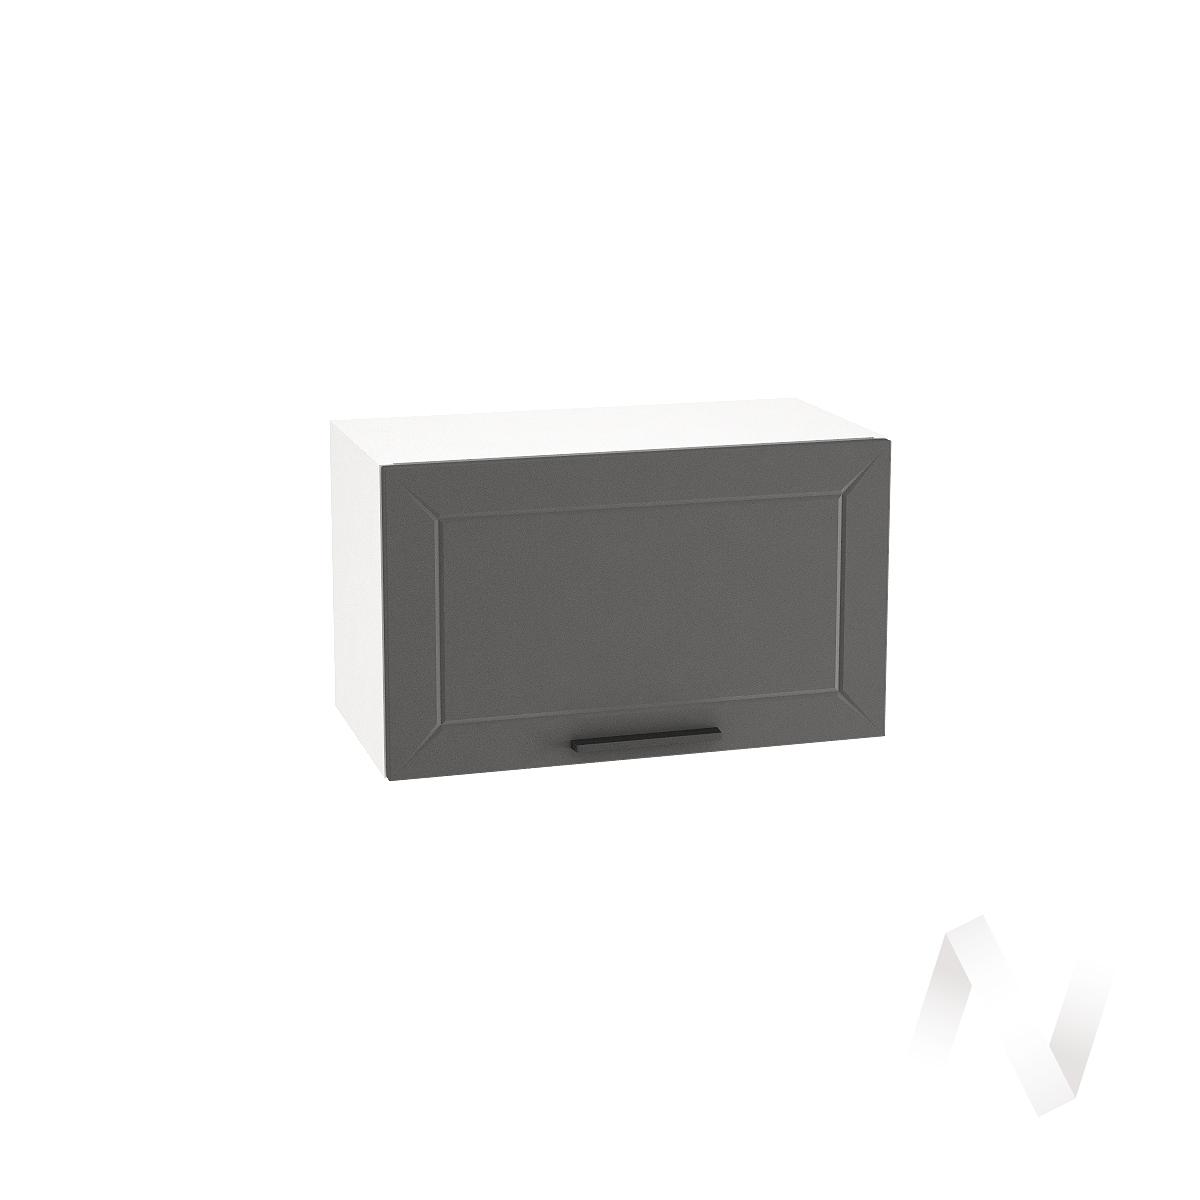 "Кухня ""Глетчер"": Шкаф верхний горизонтальный 600, ШВГ 600 (Маренго силк/корпус белый)"